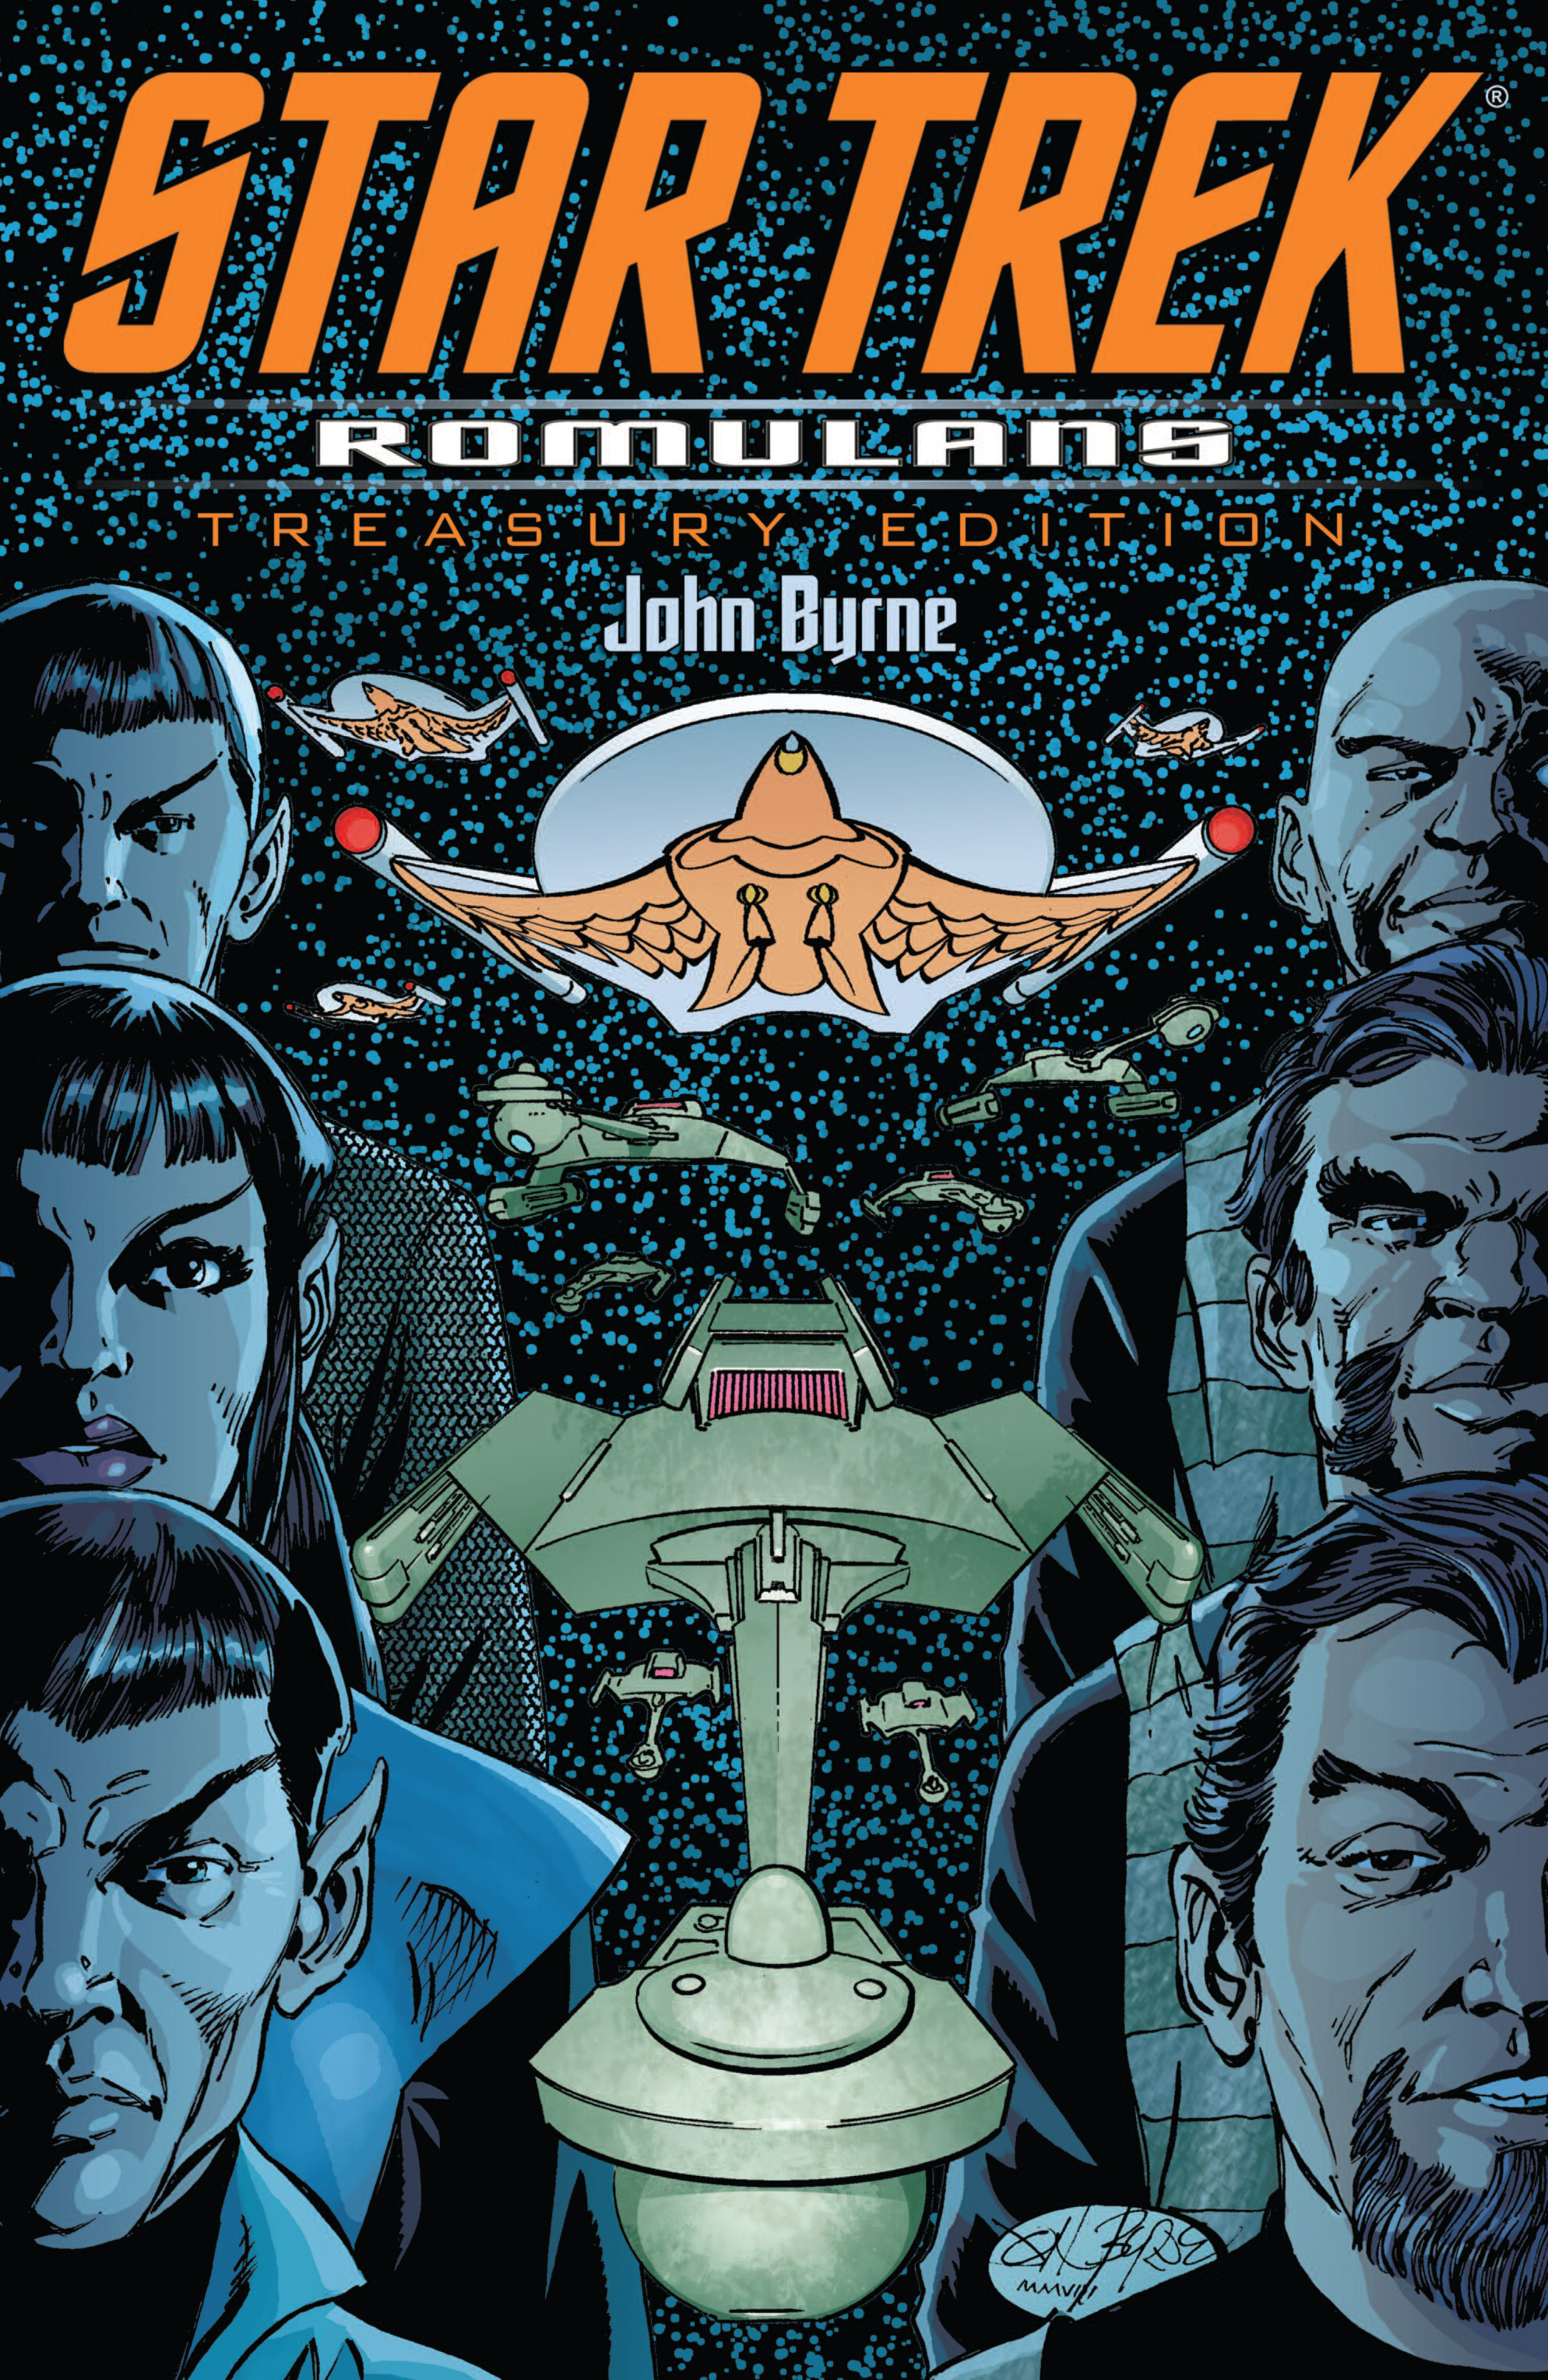 Star Trek: Romulans Treasury Edition